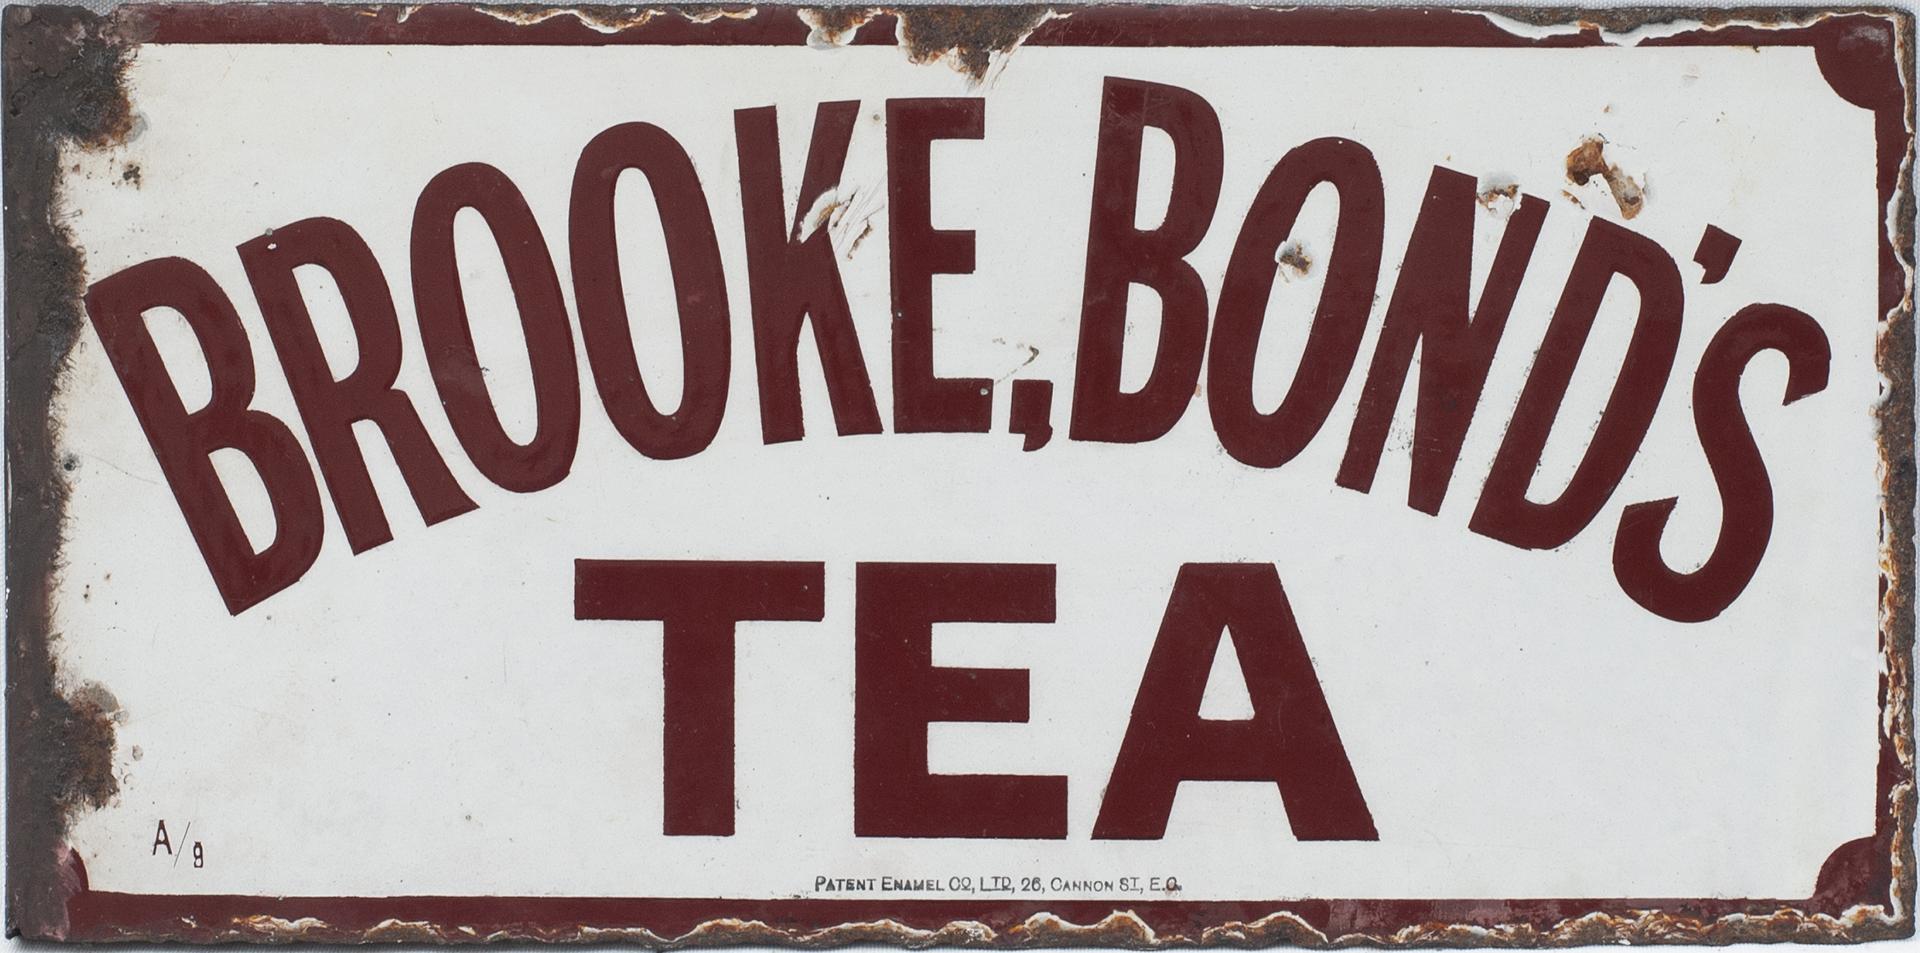 Advertising Enamel Sign BROOKE BOND'S TEA. Double